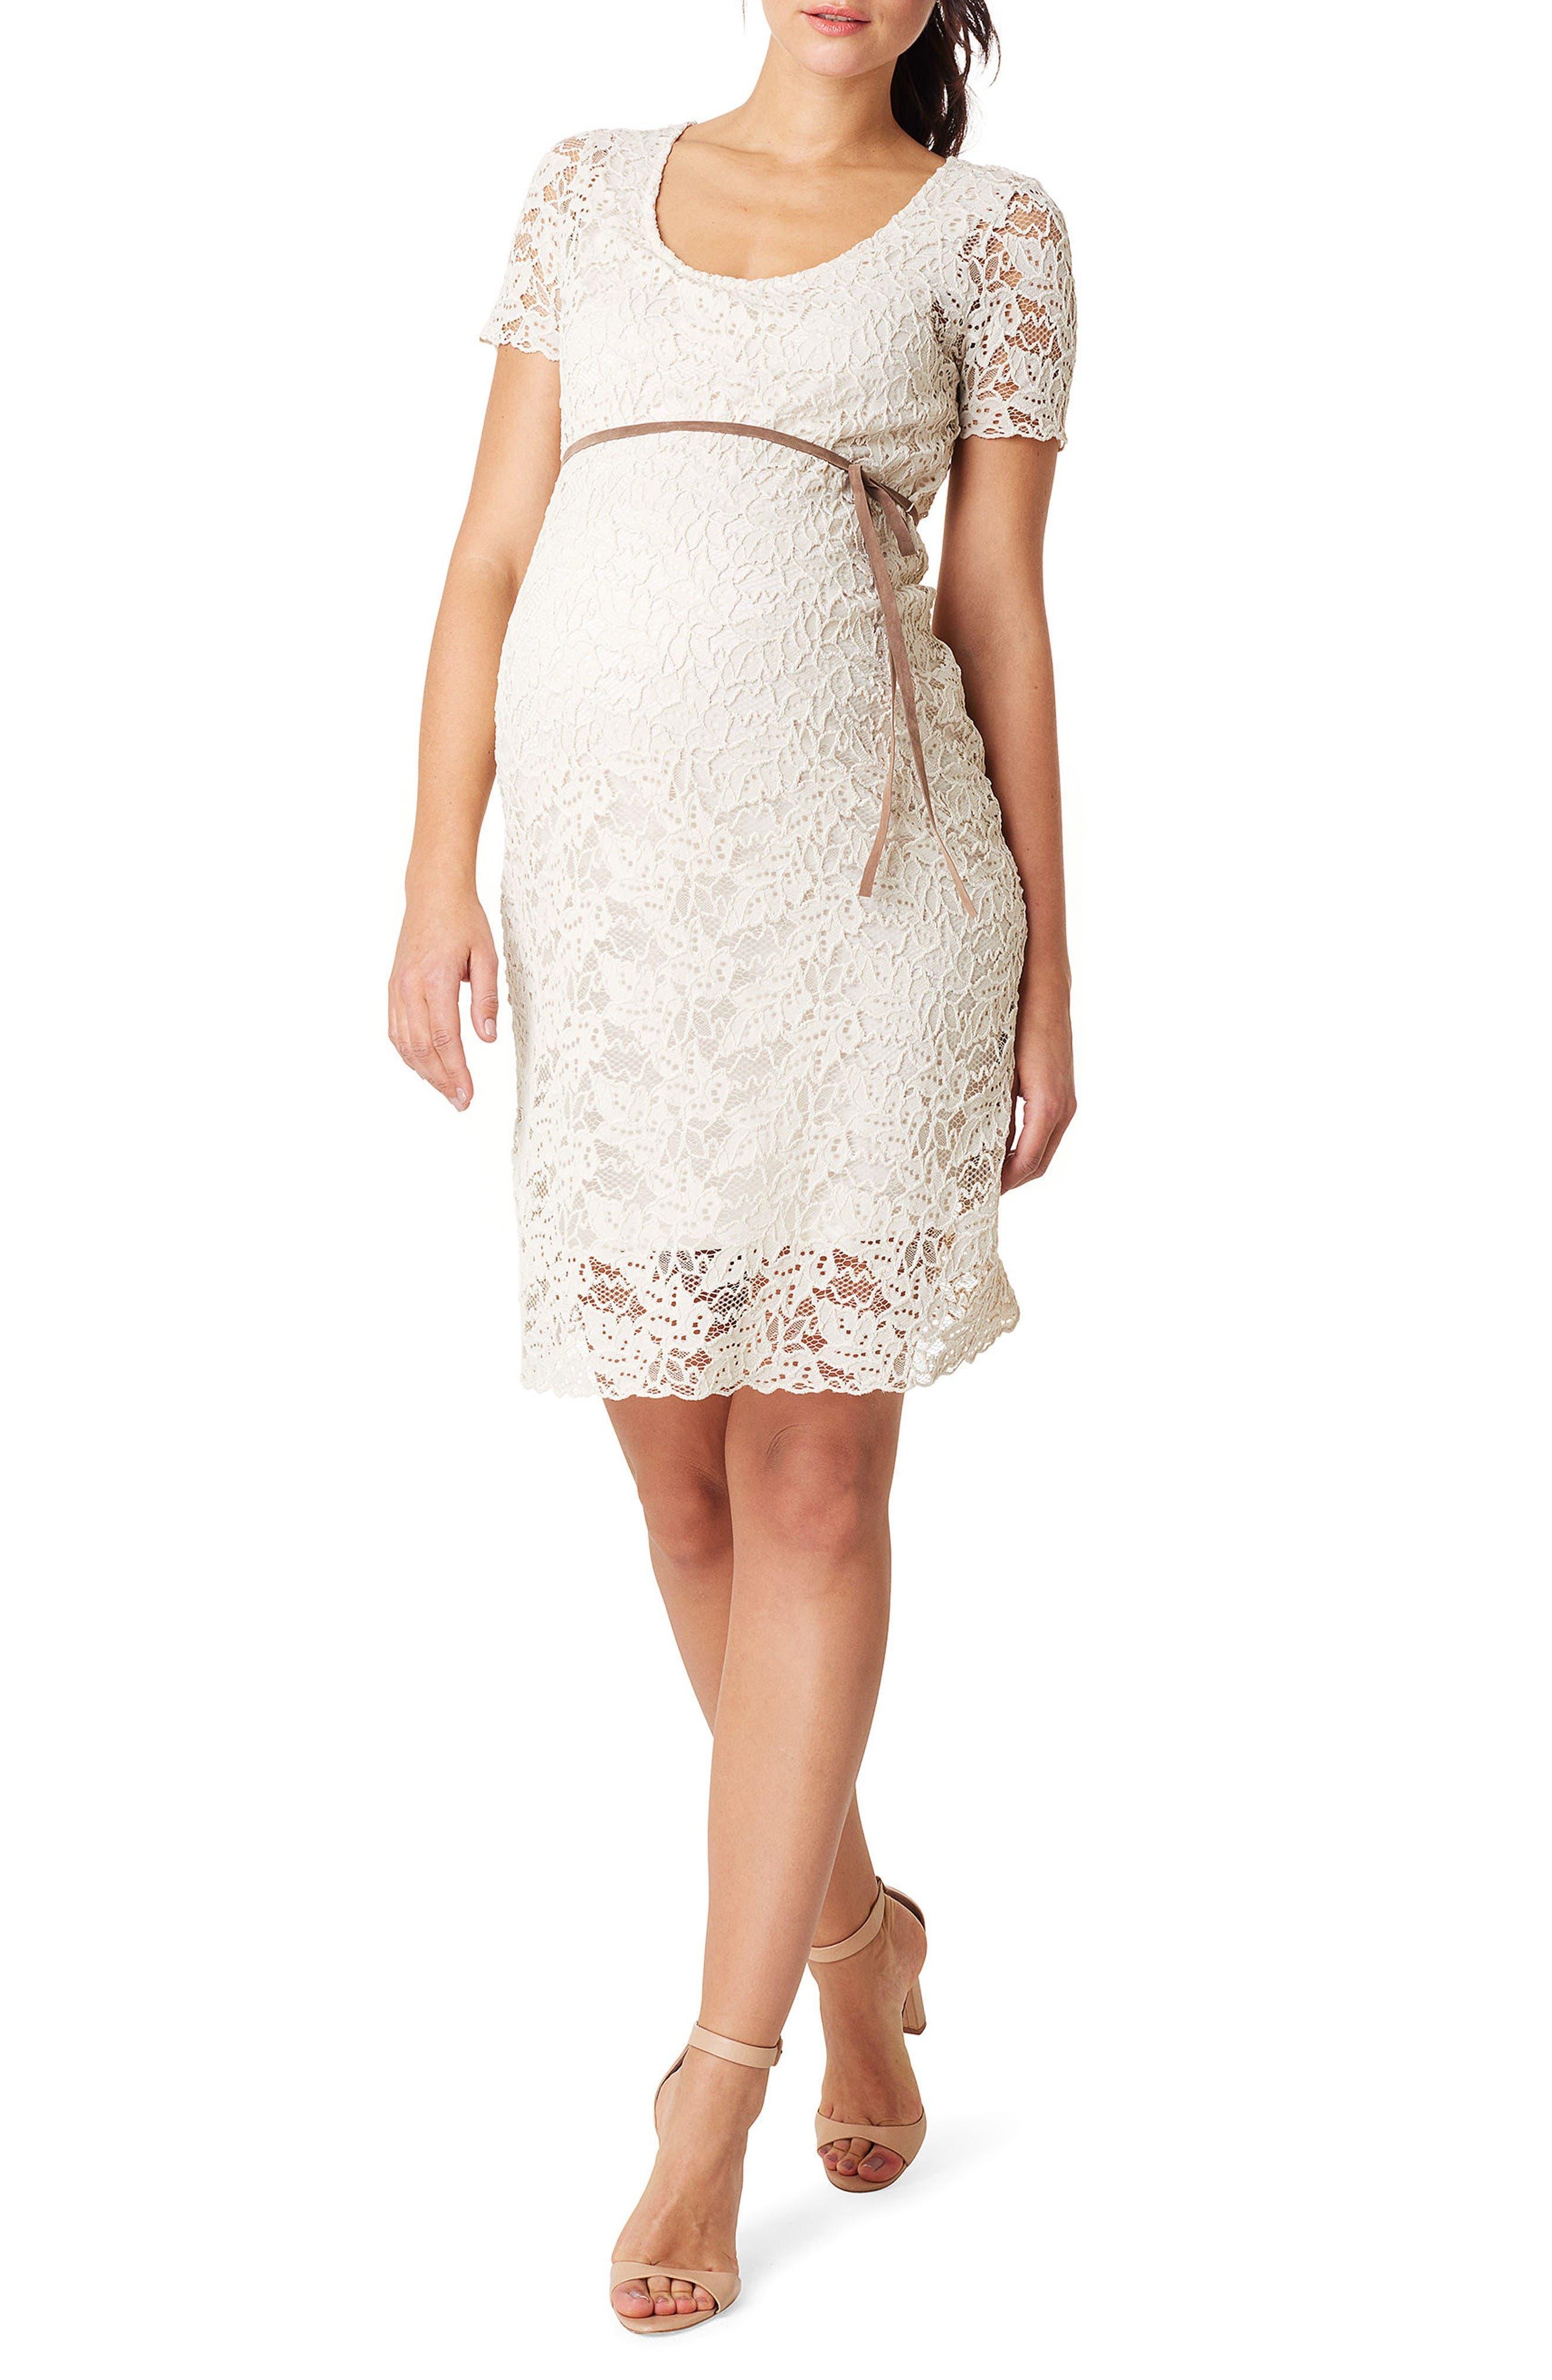 Main Image - Noppies Celia Maternity Dress